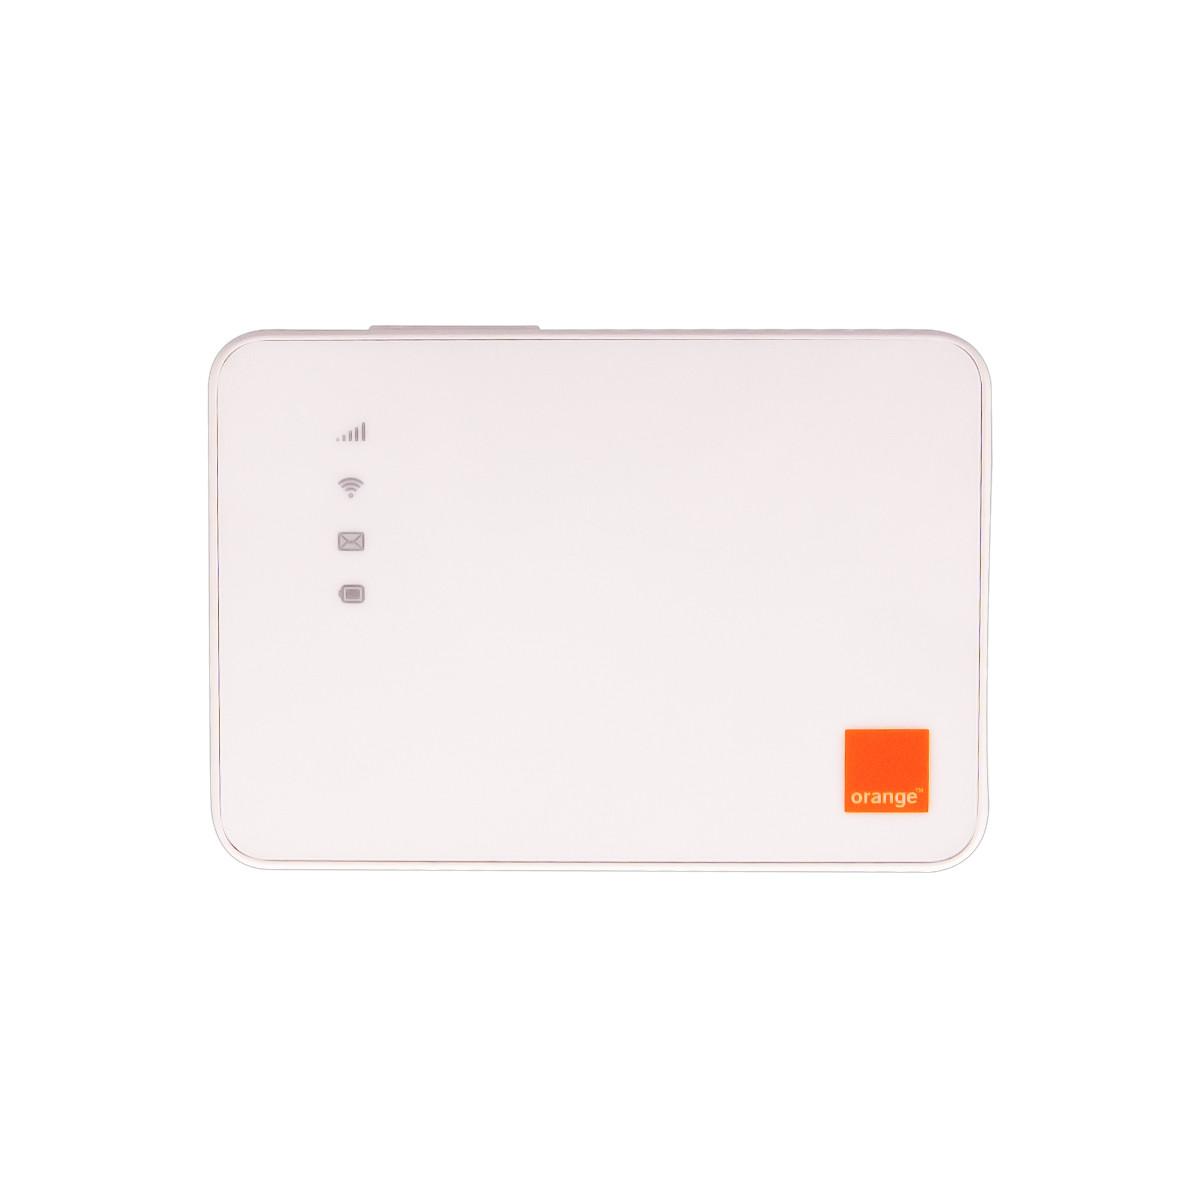 4G LTE WiFi роутер Alcatel Y858 (Киевстар, Vodafone, Lifecell)